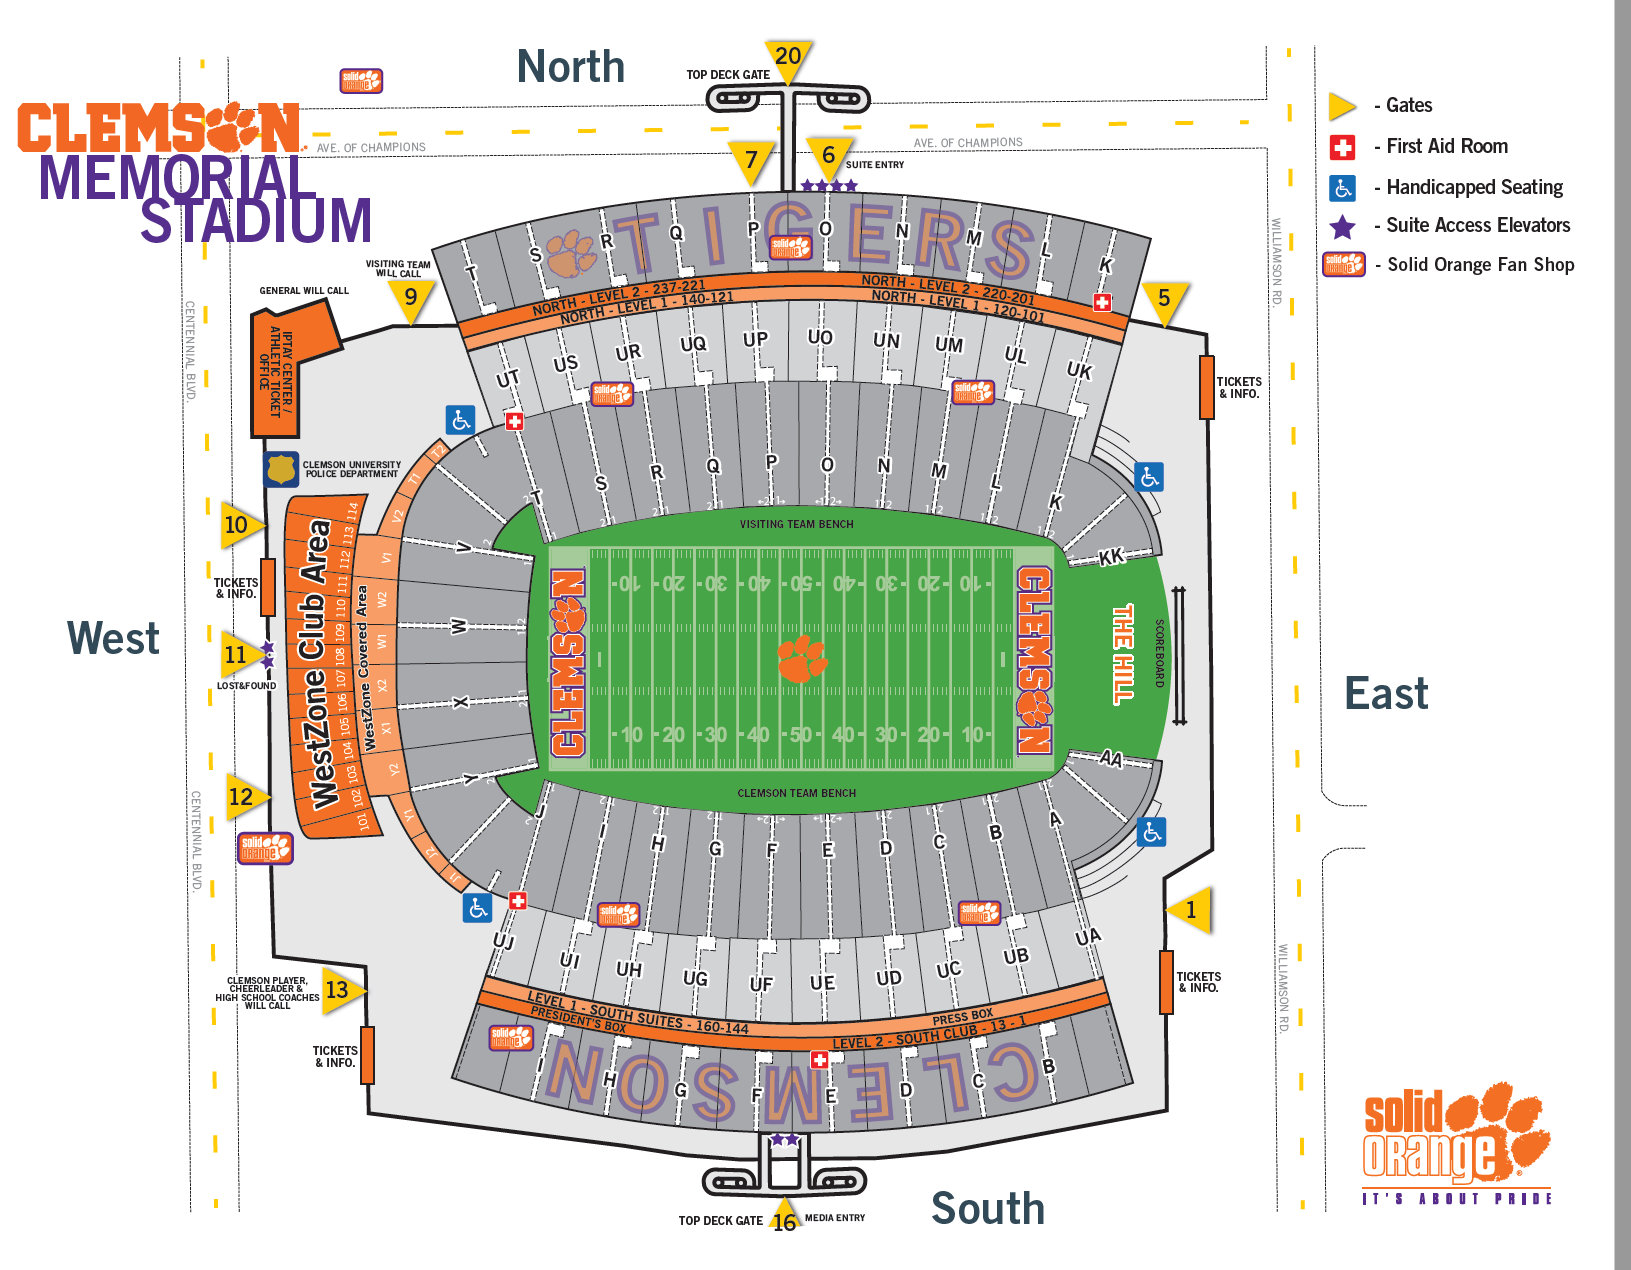 Football seating chart tigernet